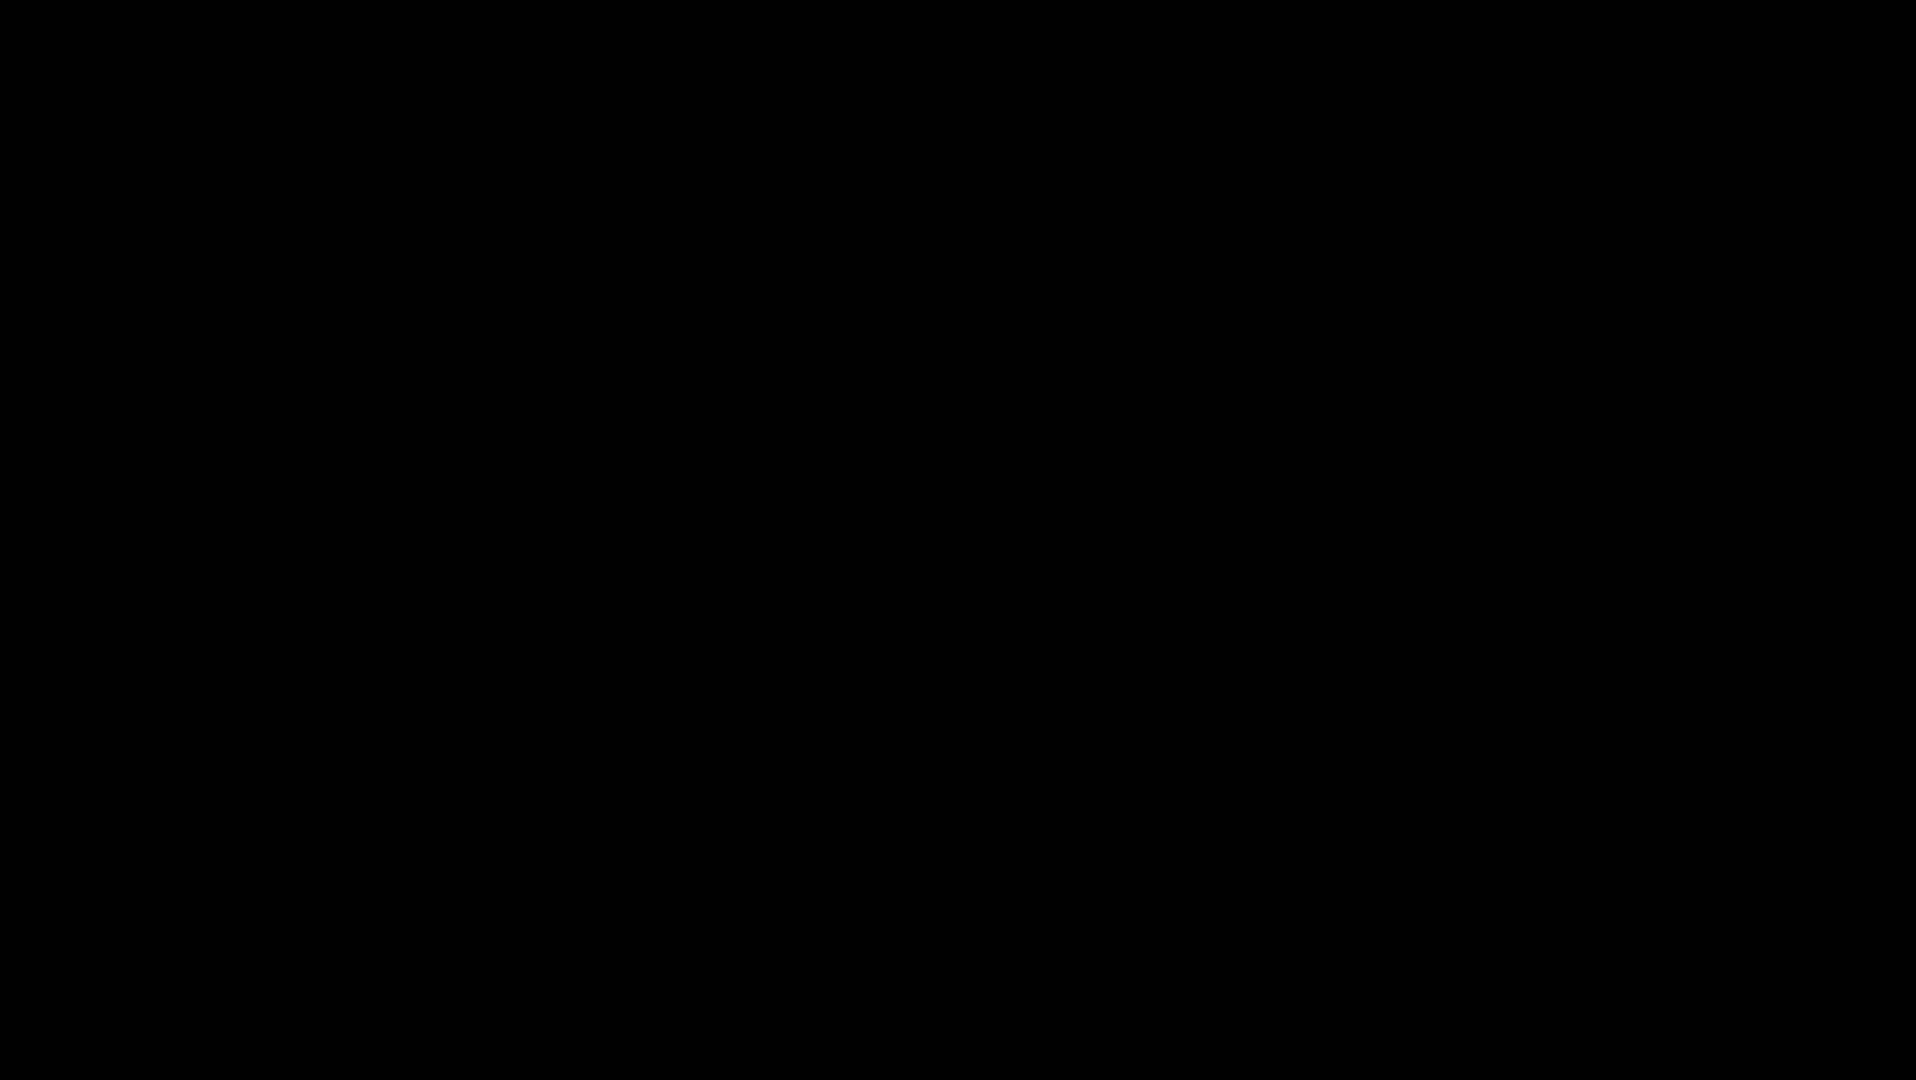 Ipason 인텔 8 코어 8700K 업그레이드 9700K 4.0 12 Gb 16GB Ram 500Gb Ssd usb Wifi 게이밍 Pc 데스크탑 컴퓨터